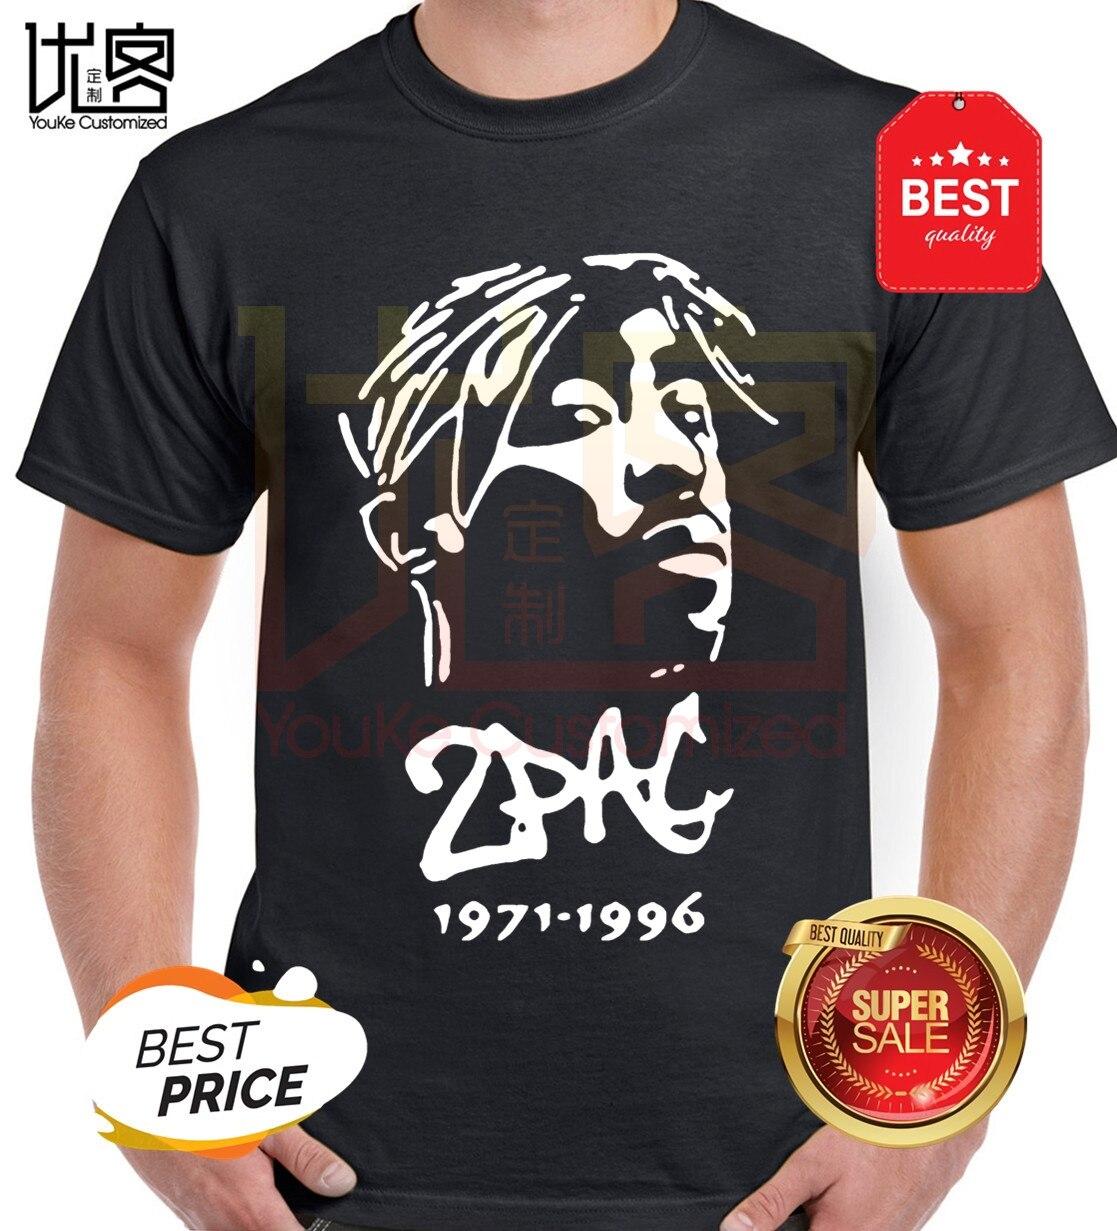 2Pac T Shirt Hiphop Tee Men Women Cotton T-Shirt Summer Top Clothing Short Sleeve Tshirt Tupac Hip Hop